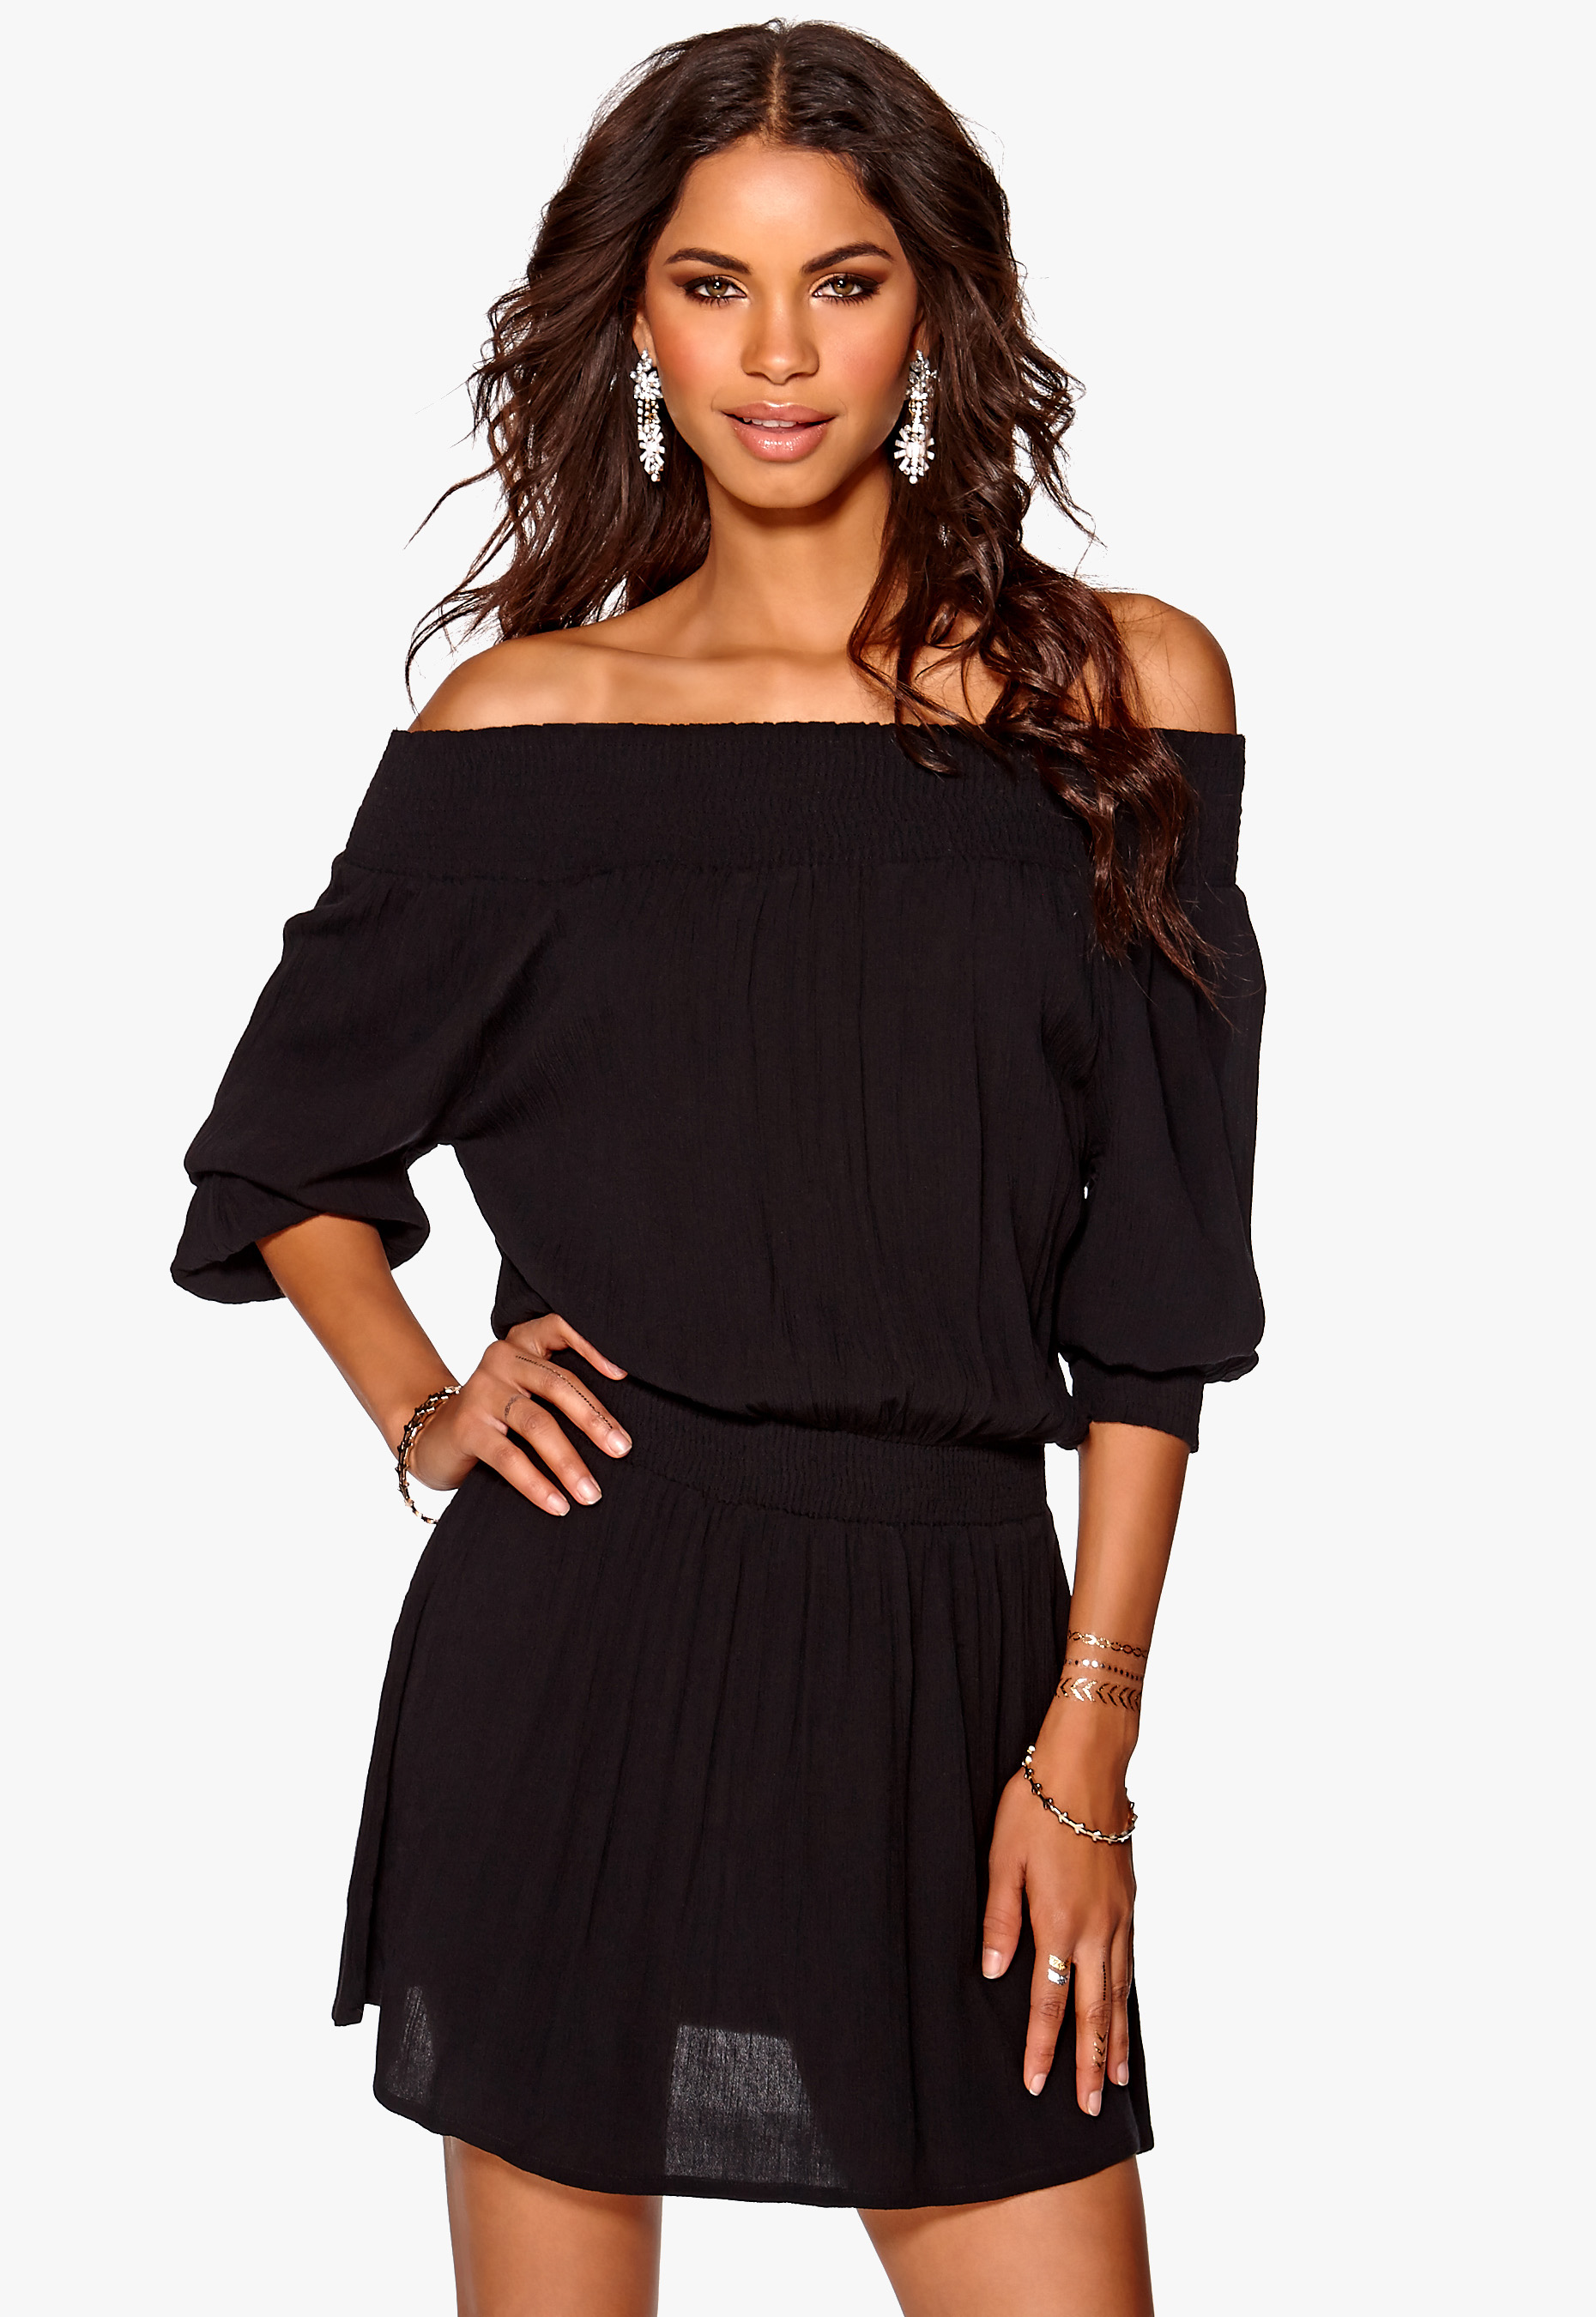 962e56cc Make Way Daphne Dress Black - Bubbleroom